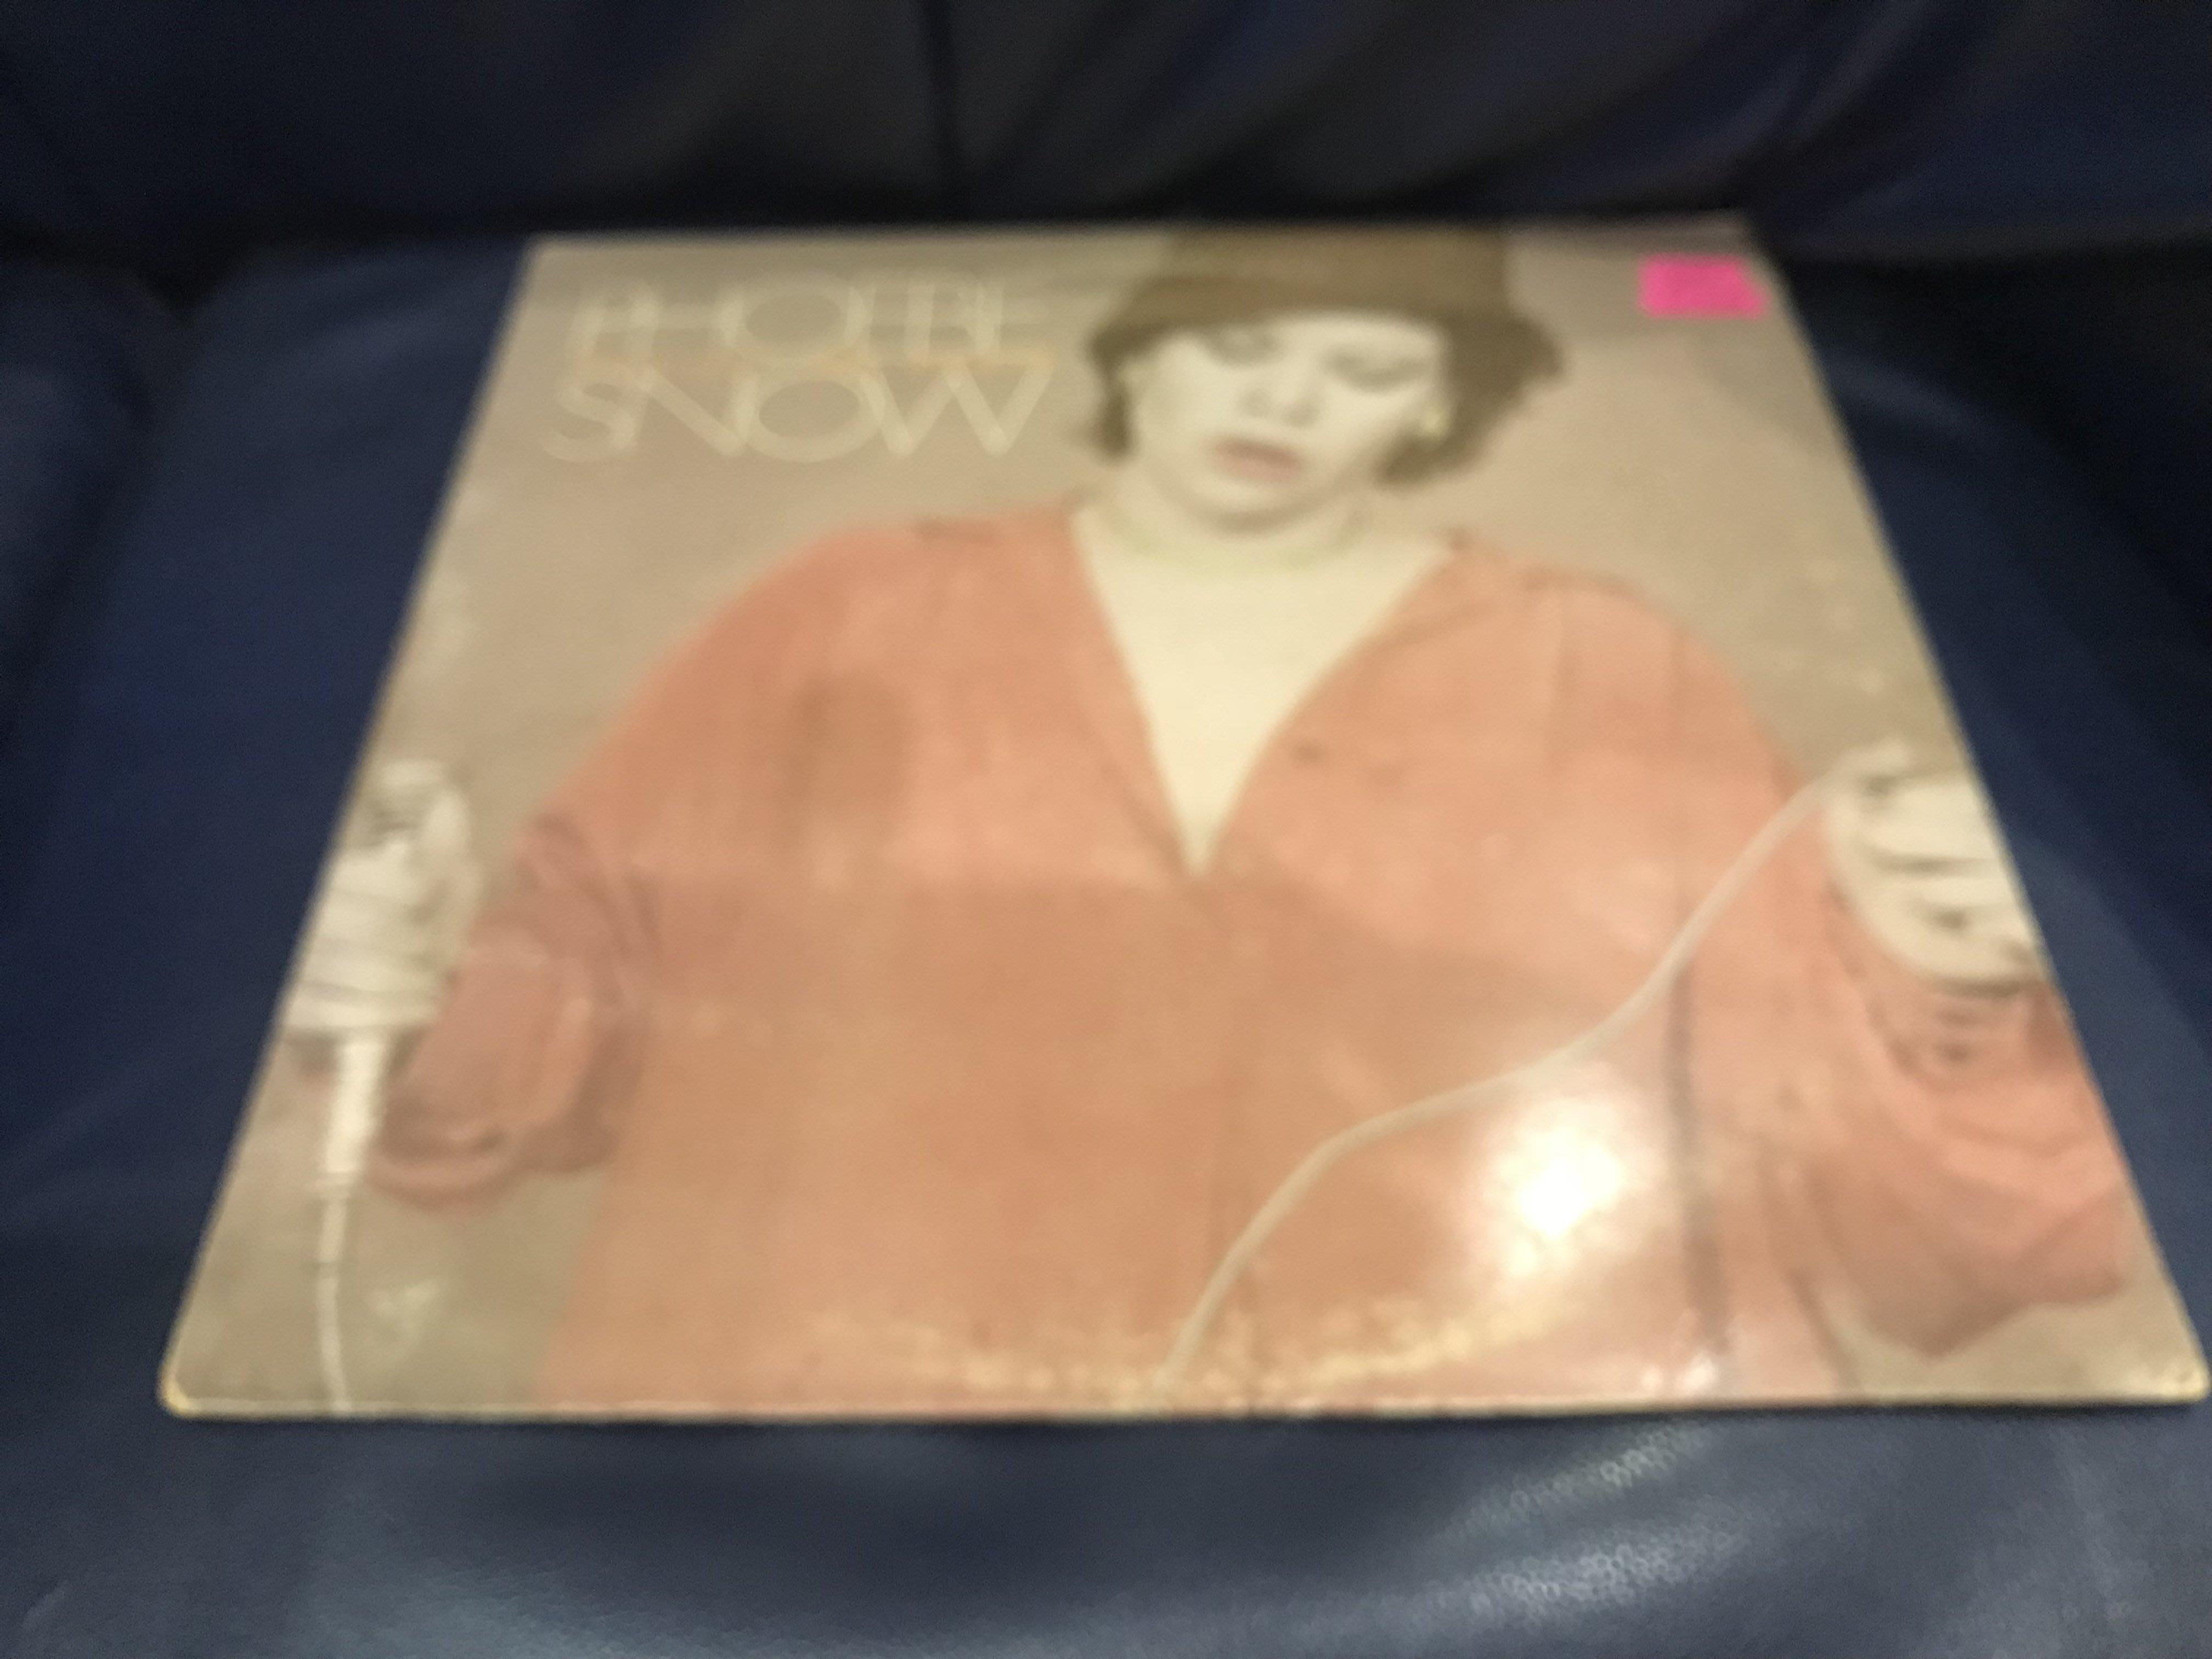 開心唱片 (PHOEBE SNOW / AGAINST THE GRAIN) 二手 黑膠唱片 CC204